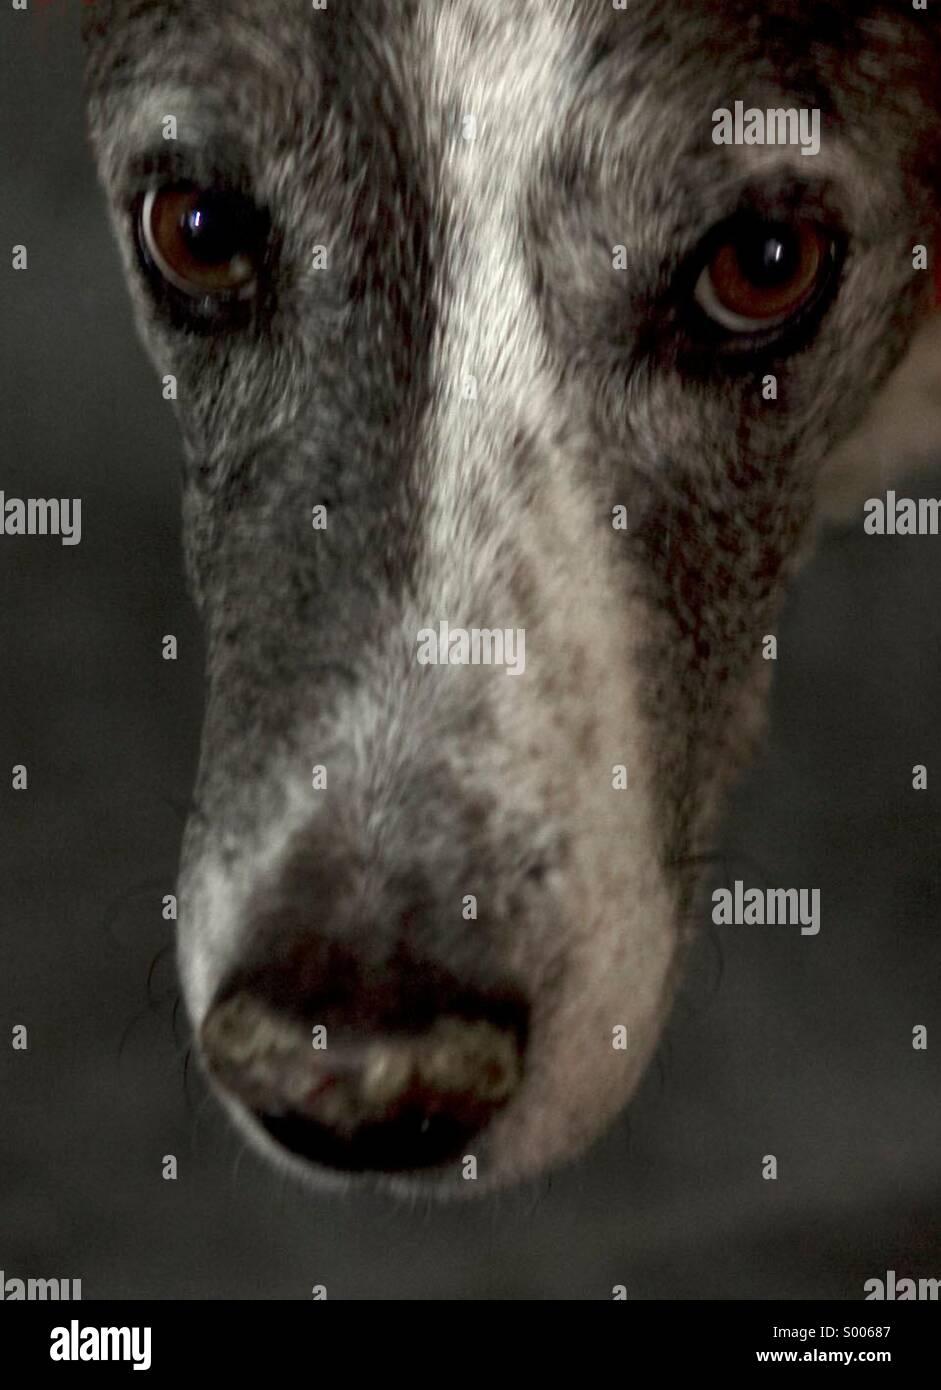 Dog, Catahoula, Breed, Face, Looking at Camera, Pet, Animal, Domesticated, Eyes, Close-up, No People - Stock Image